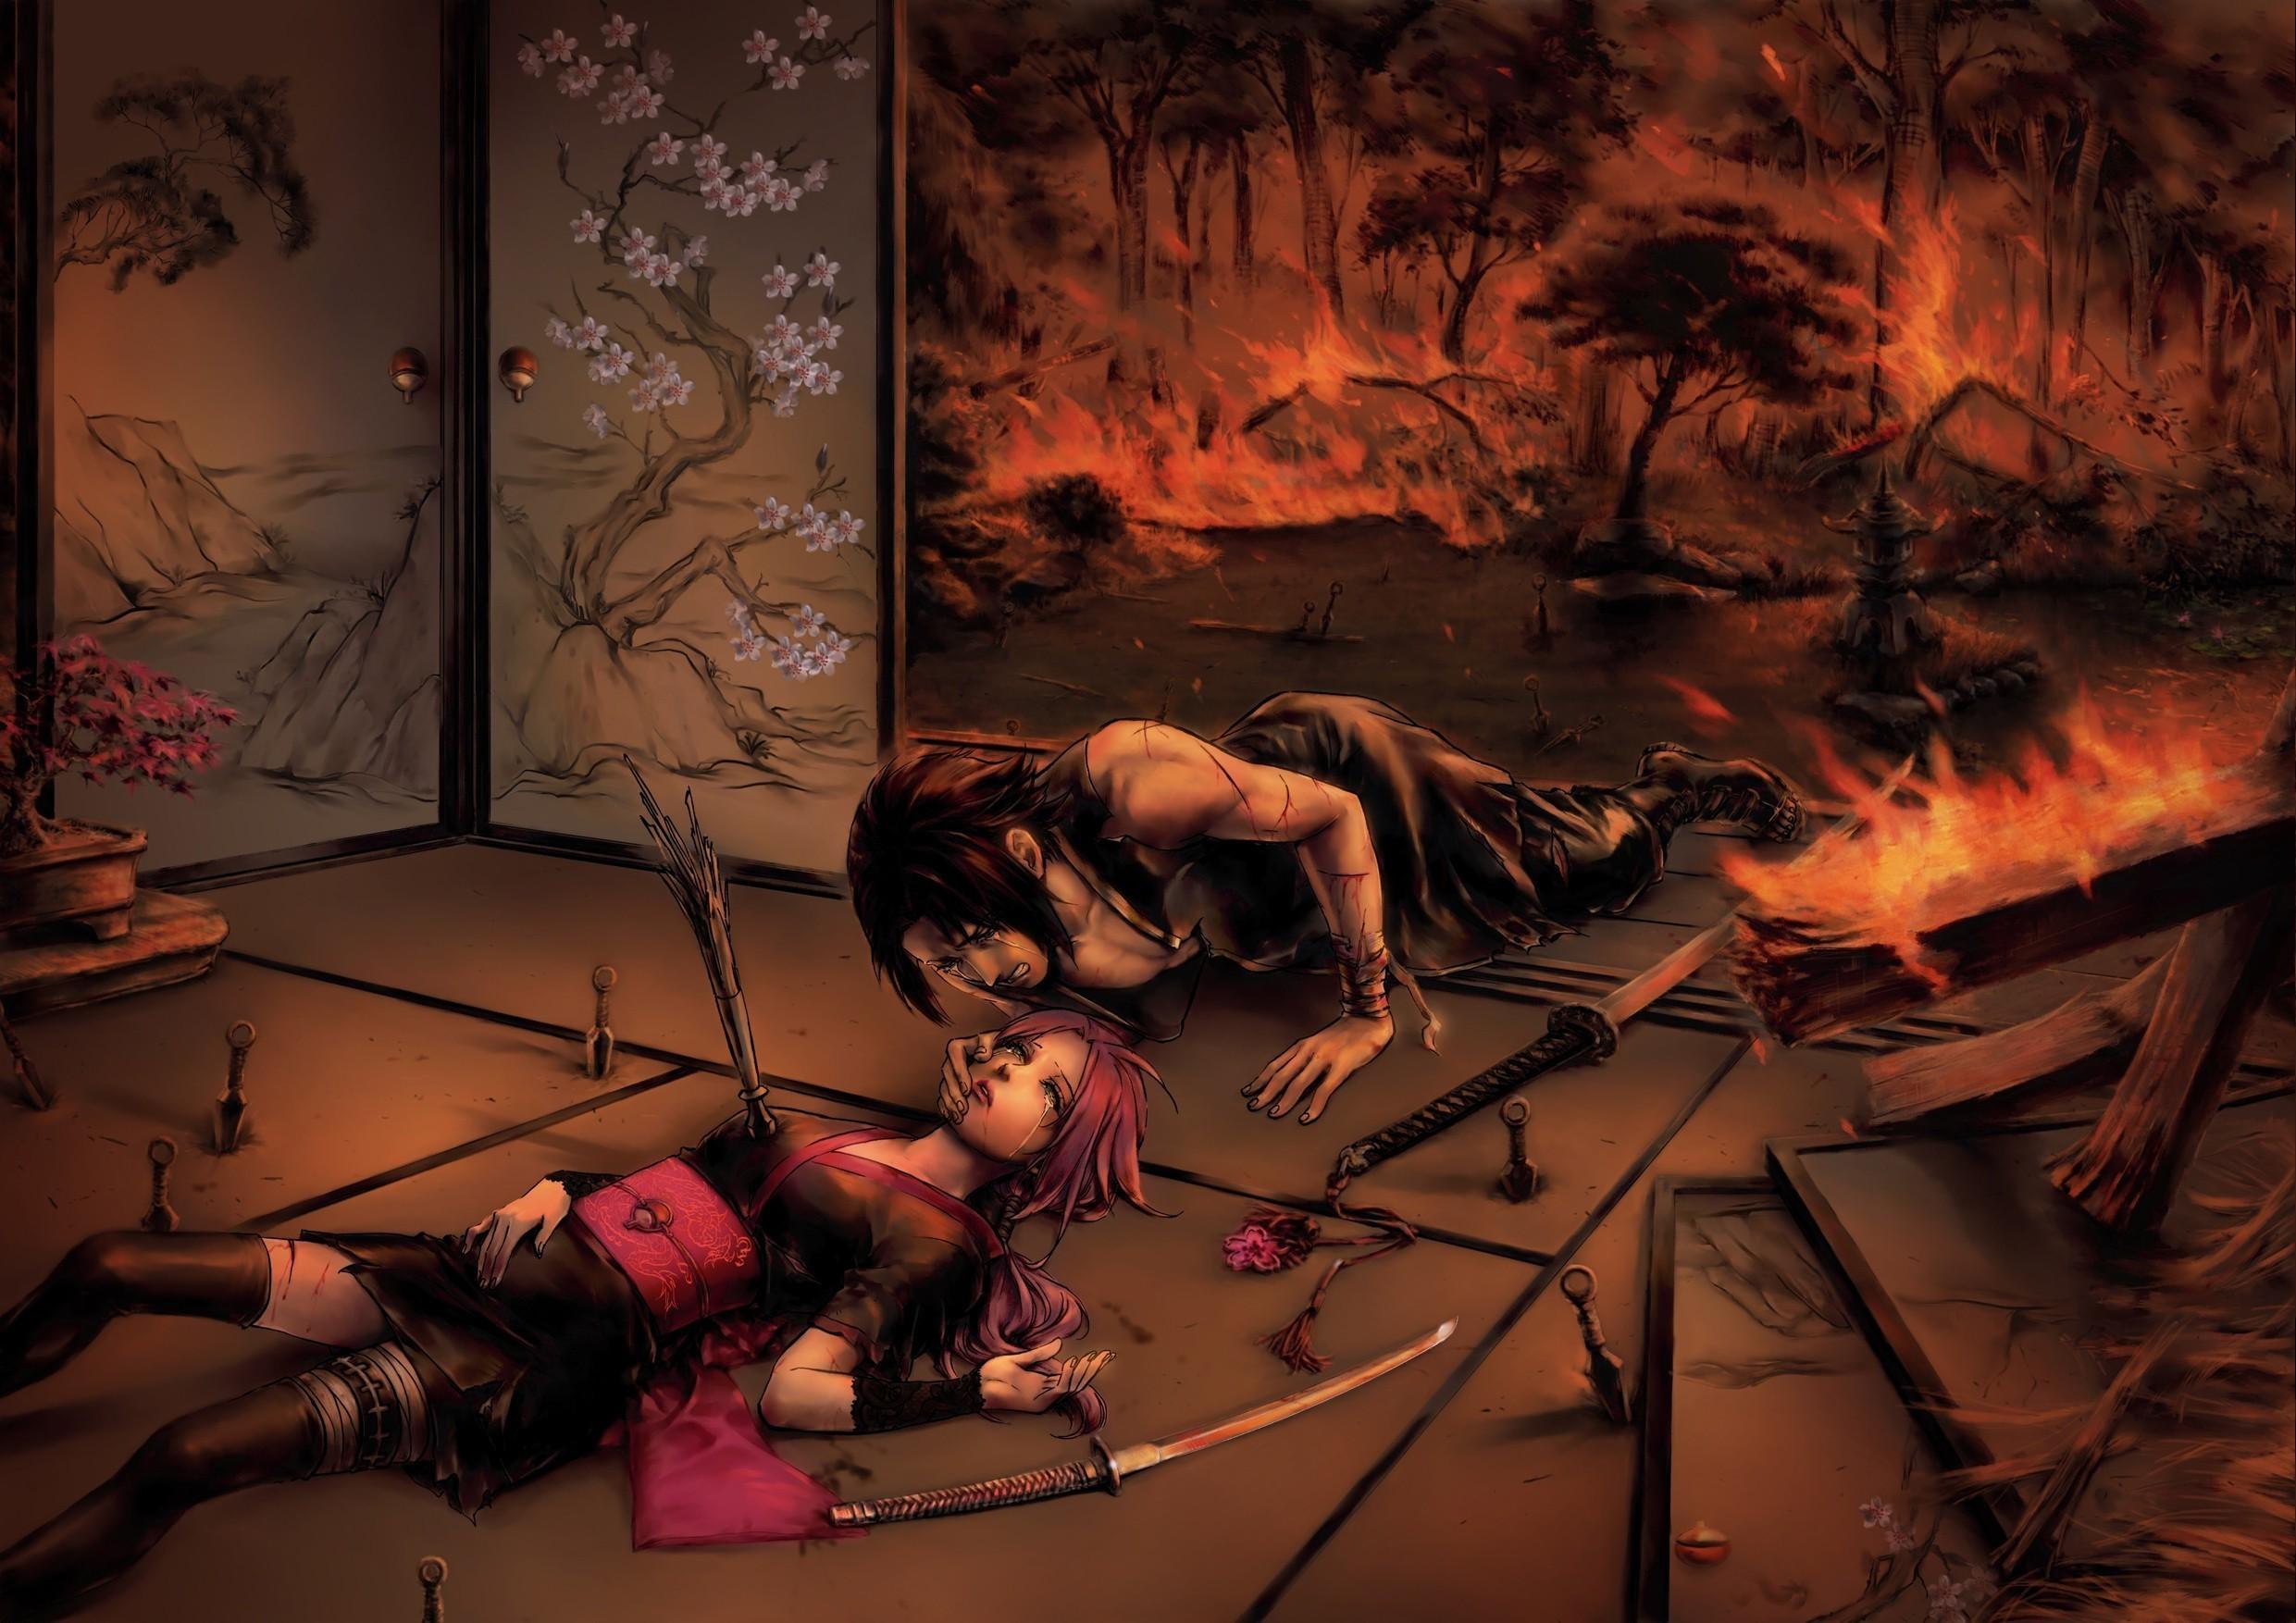 Res: 2481x1754, Naruto Shippuuden, Anime, Manga, Uchiha Sasuke, Haruno Sakura Wallpapers HD  / Desktop and Mobile Backgrounds